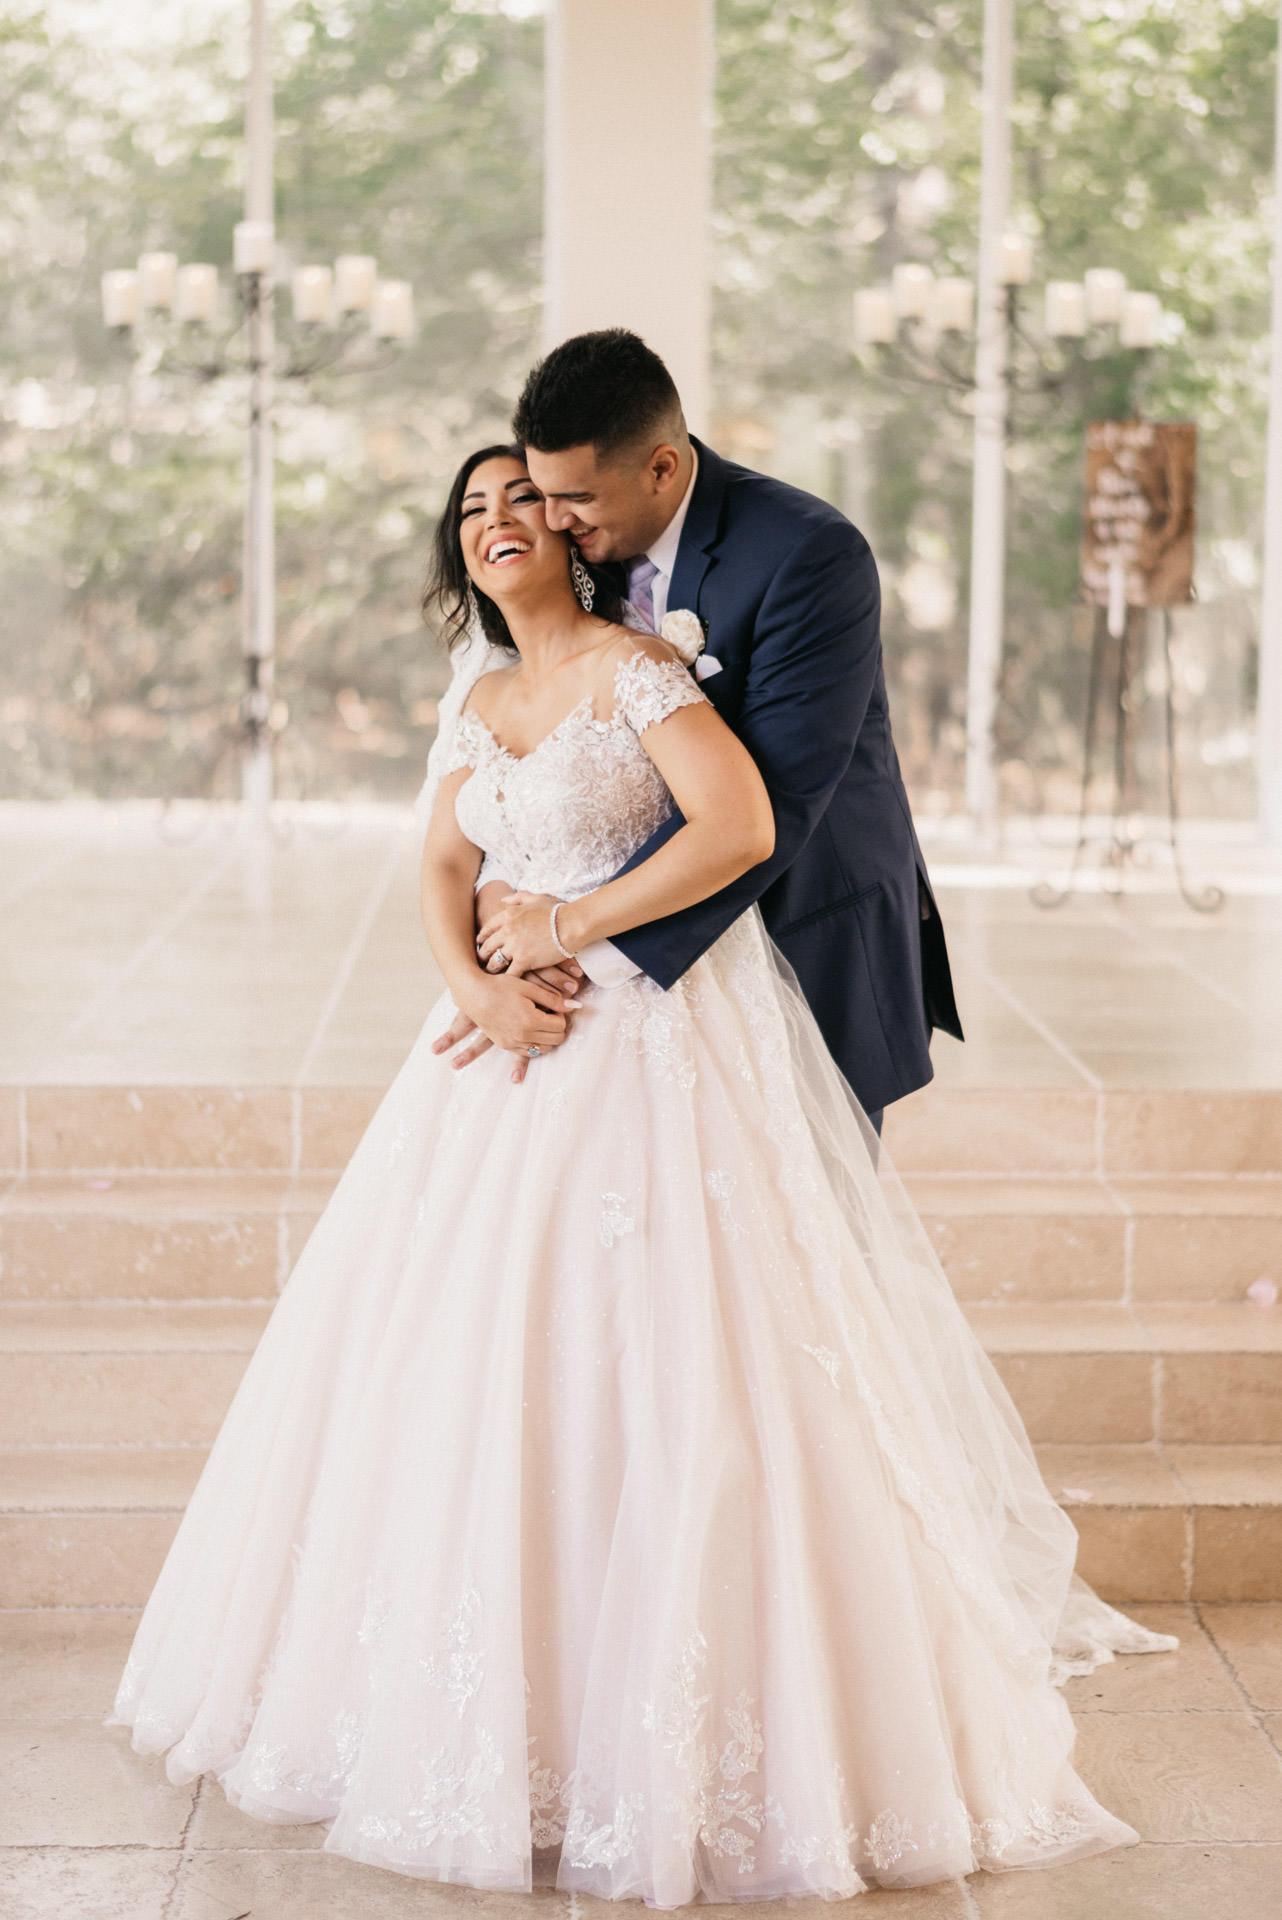 lexi-michael-wedding-blog-sm-82.jpg